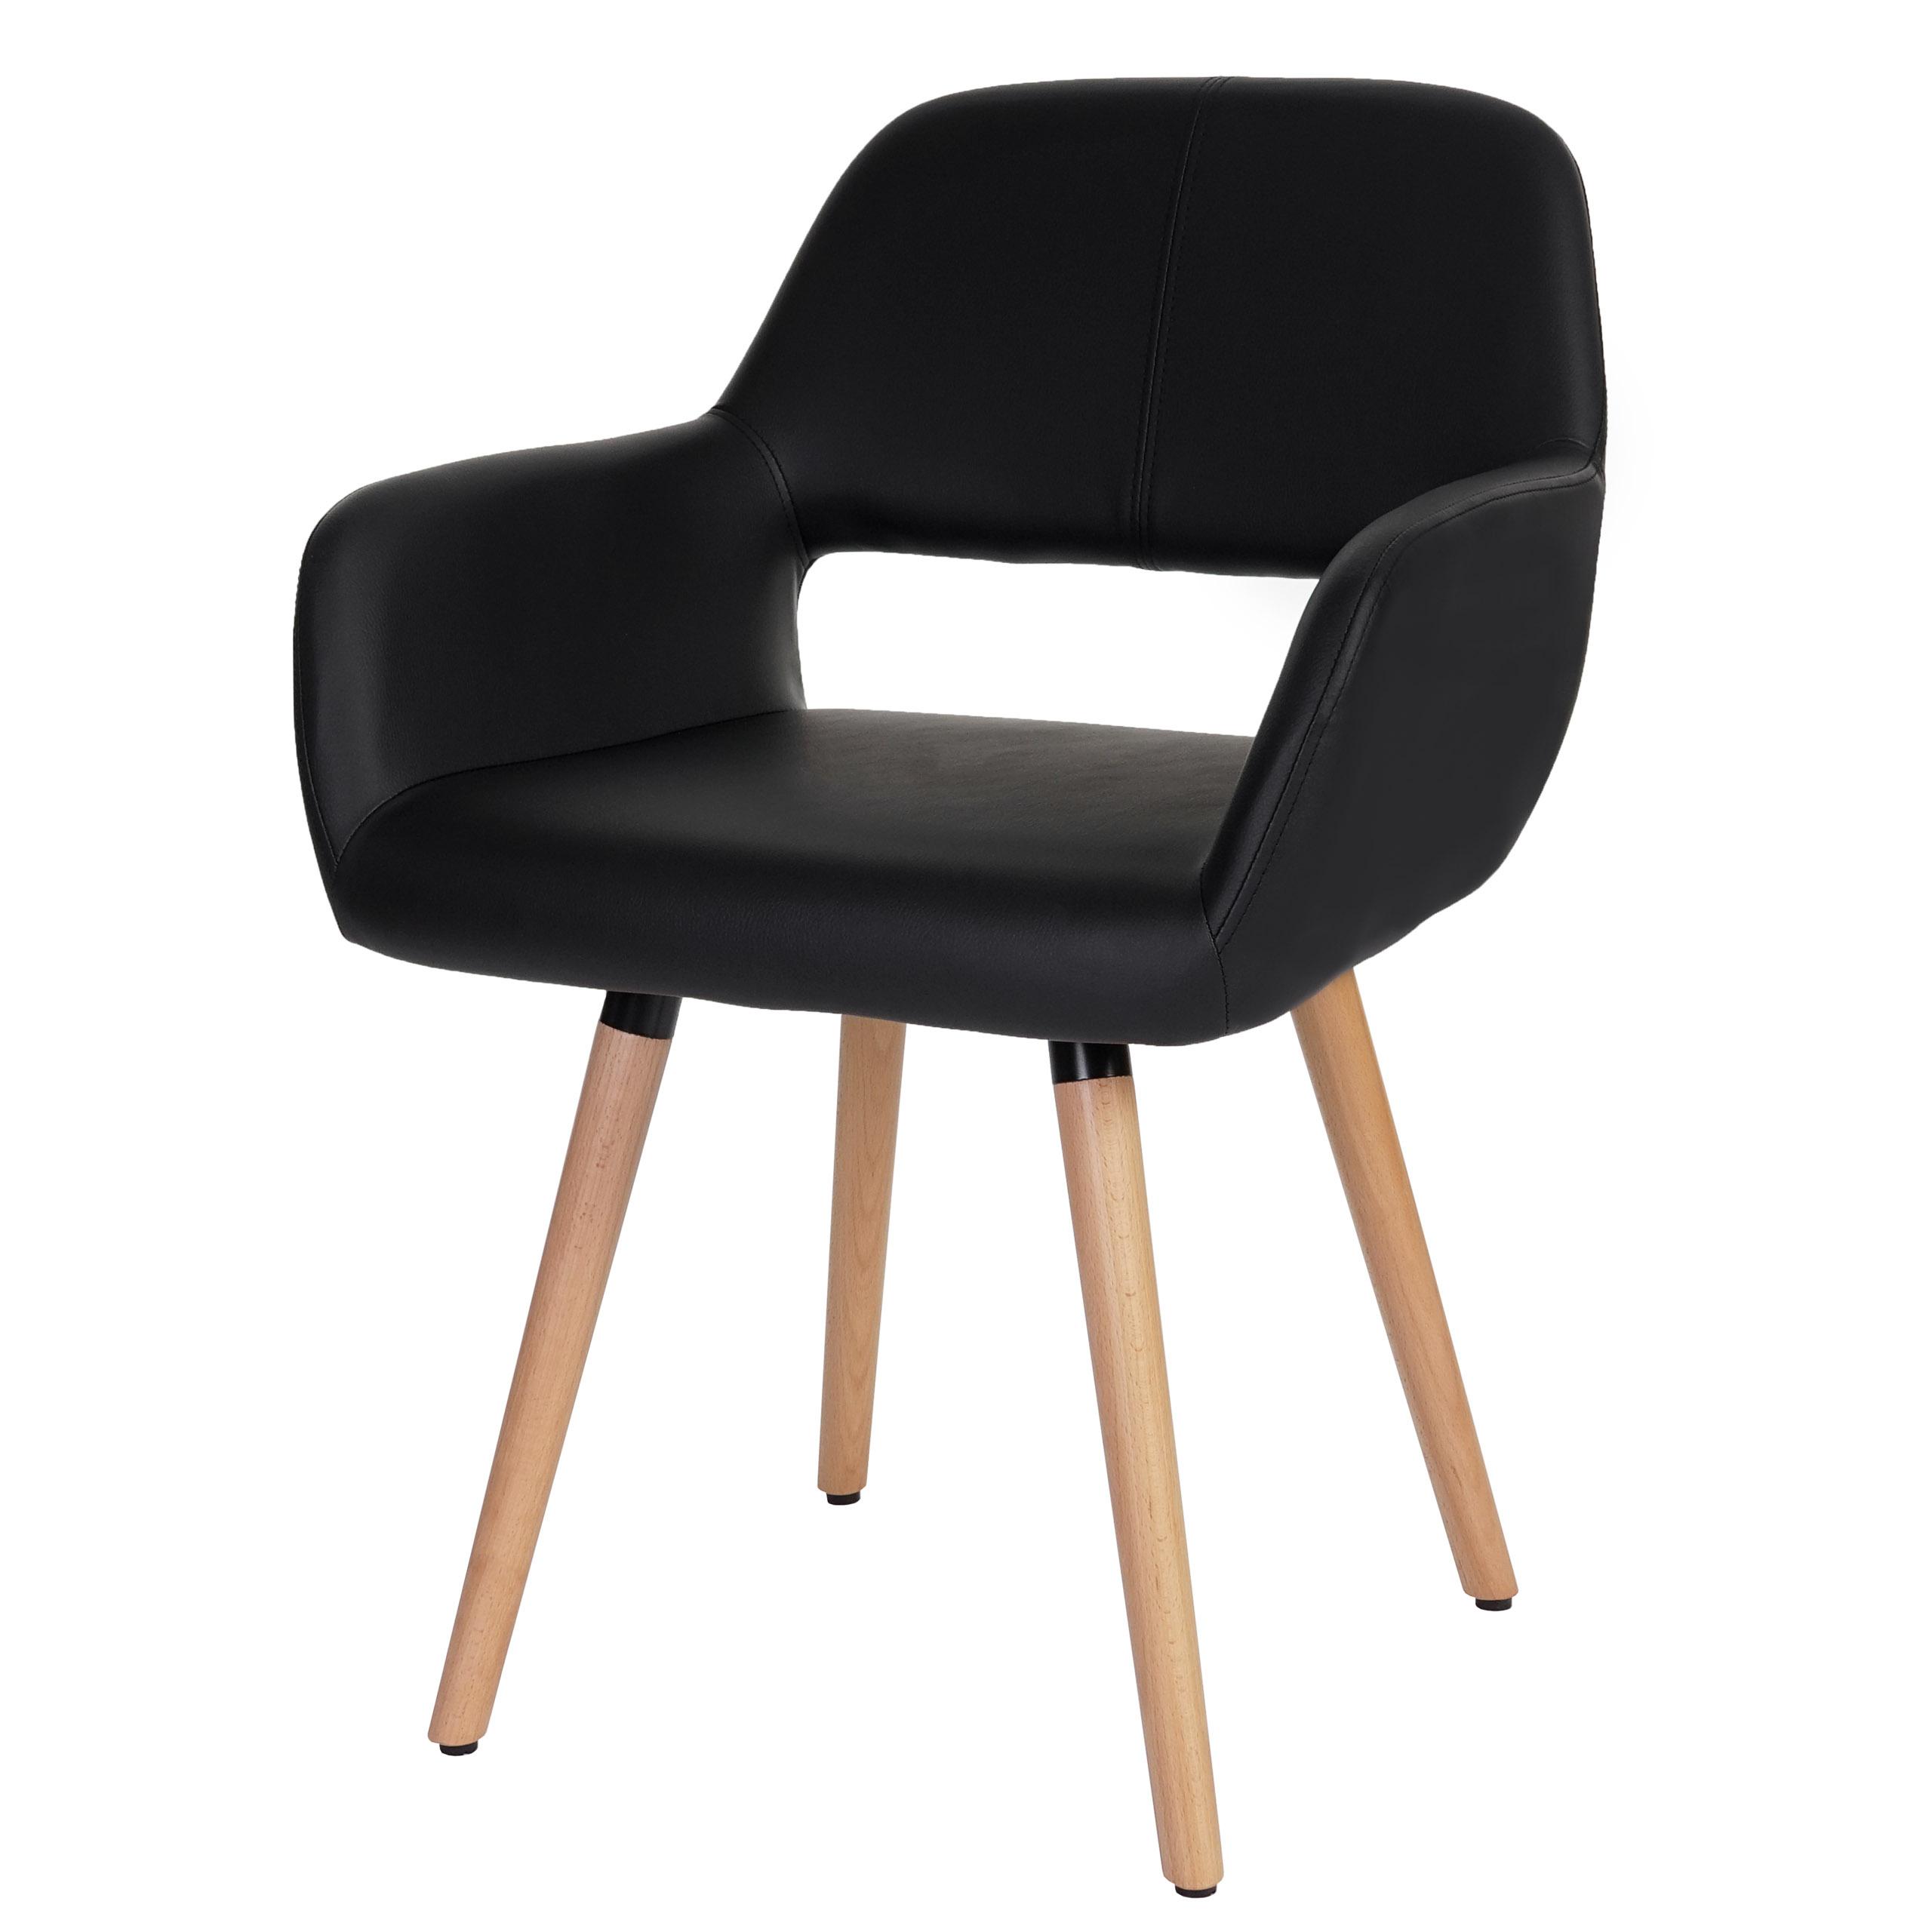 esszimmerstuhl dohna ii stuhl lehnstuhl retro design. Black Bedroom Furniture Sets. Home Design Ideas